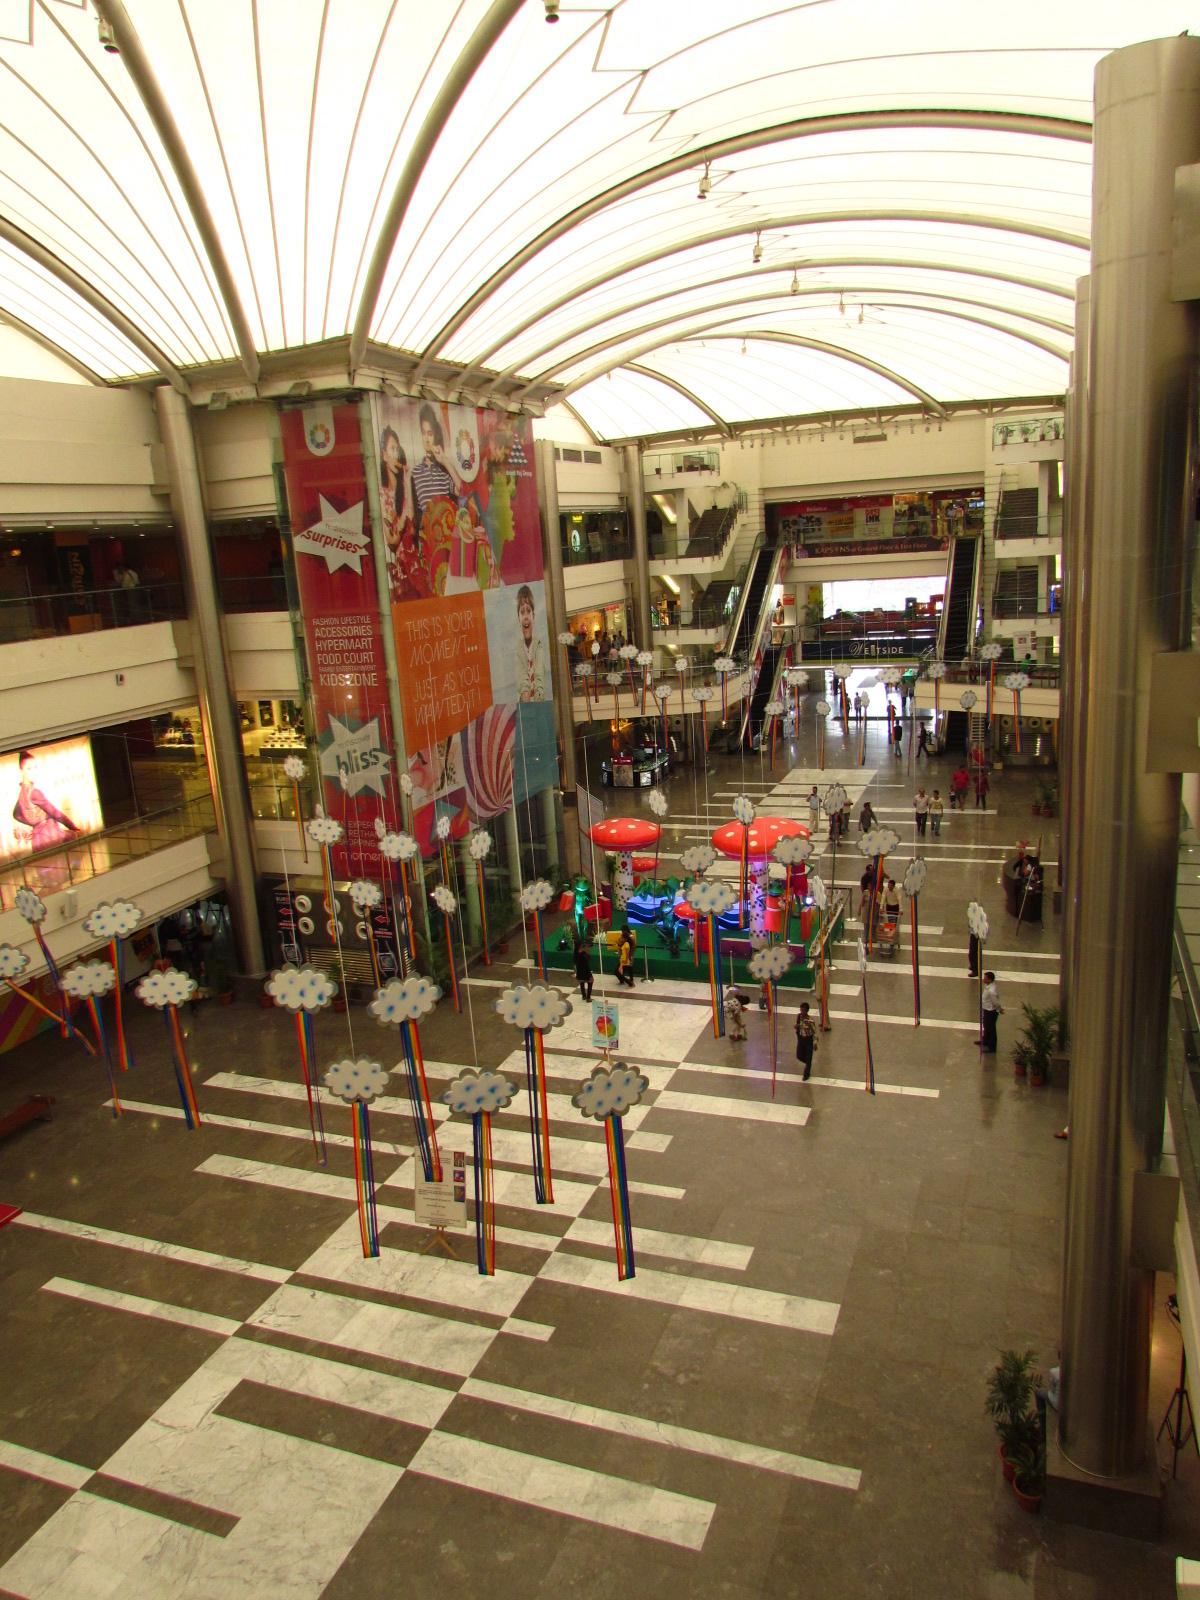 The mezze grill food court magic moments mall kirti